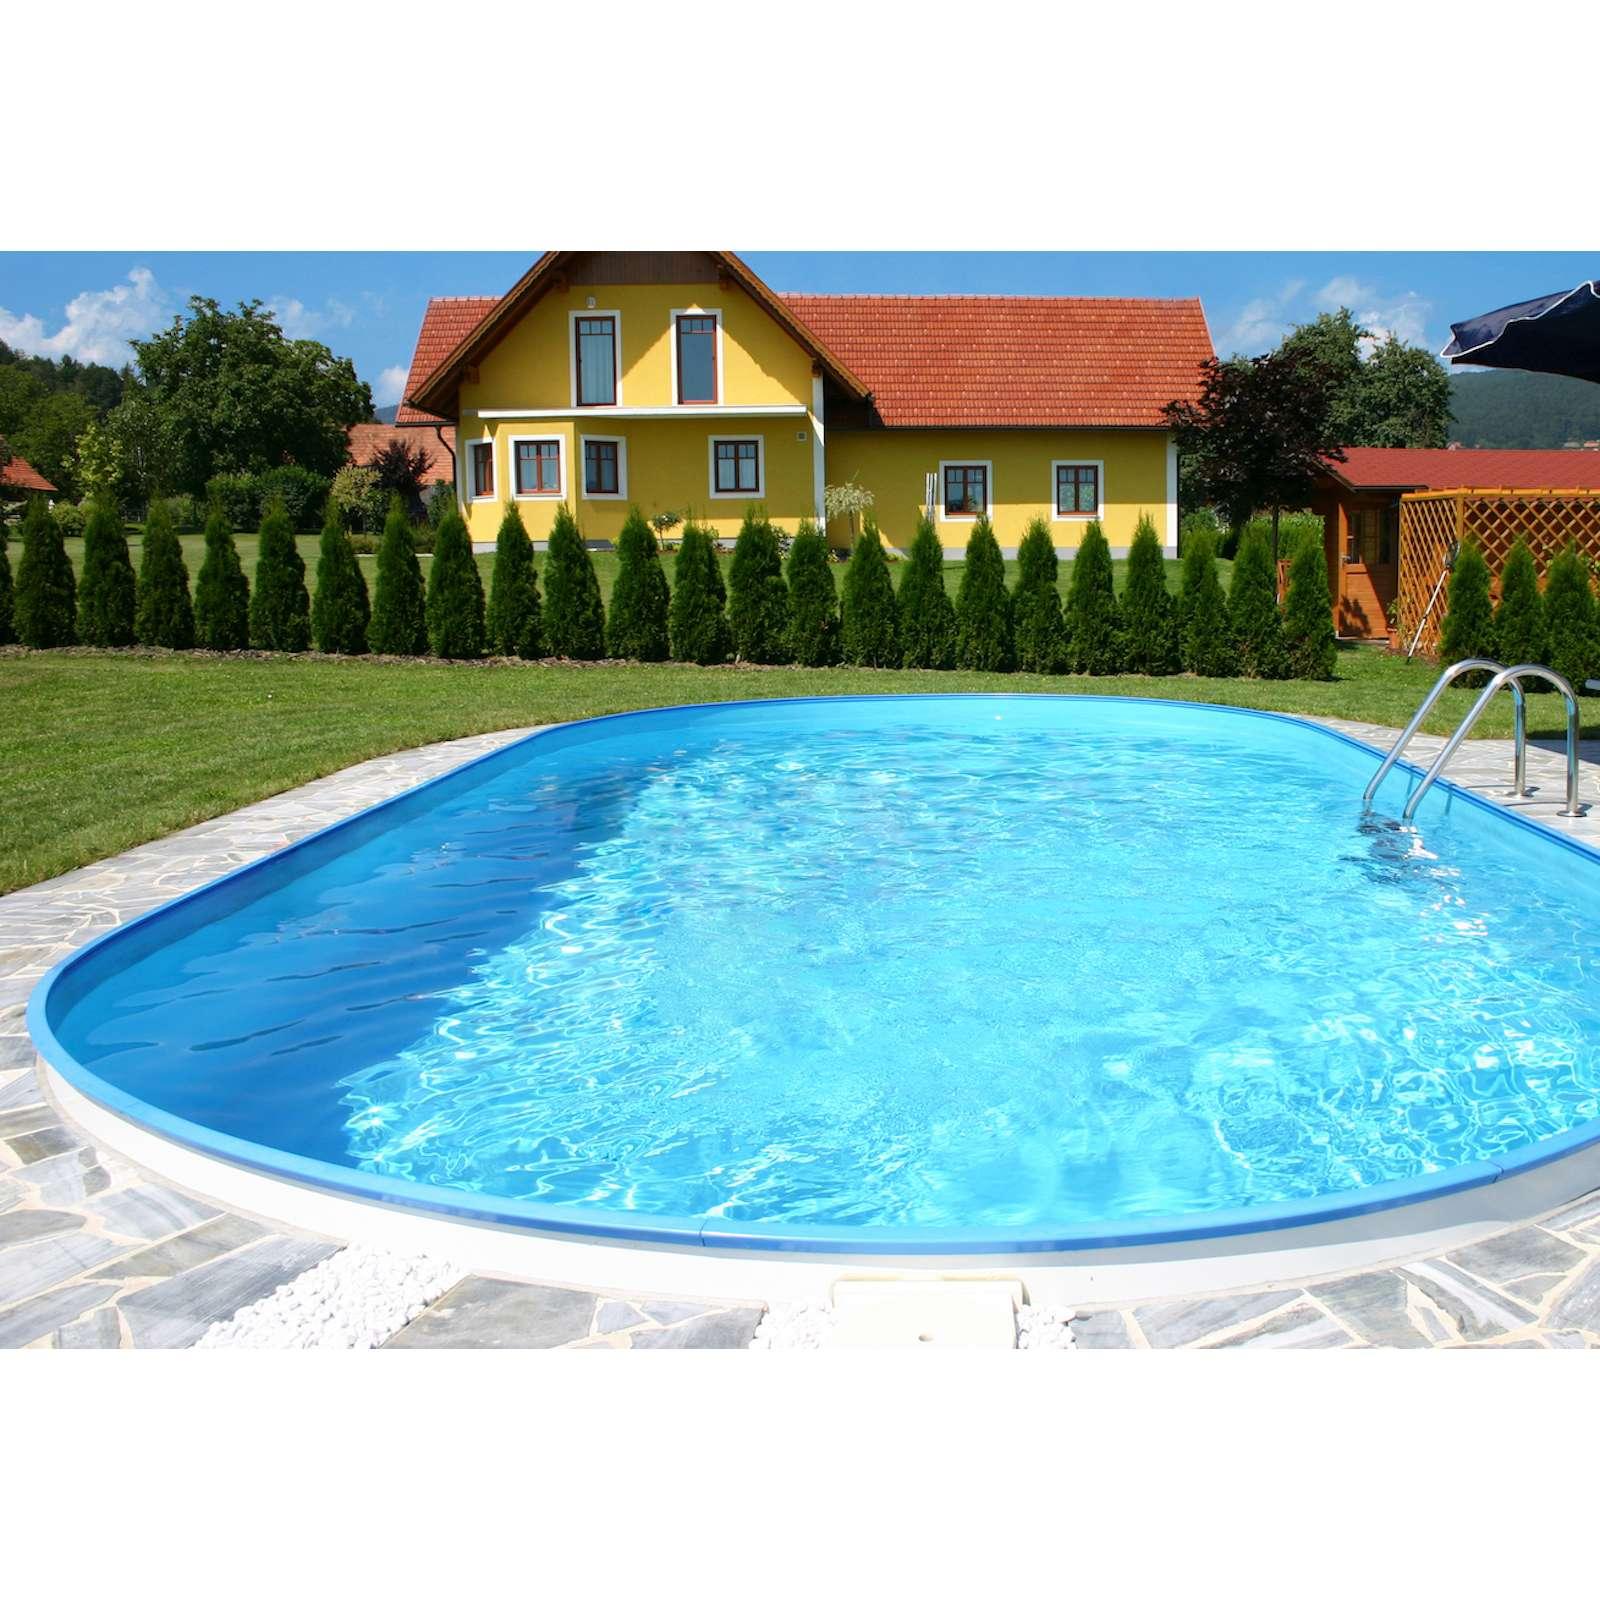 Pool Schwimmbecken OVAL Stahlwand 4 Größen Höhe 150 cm Swimmingpool